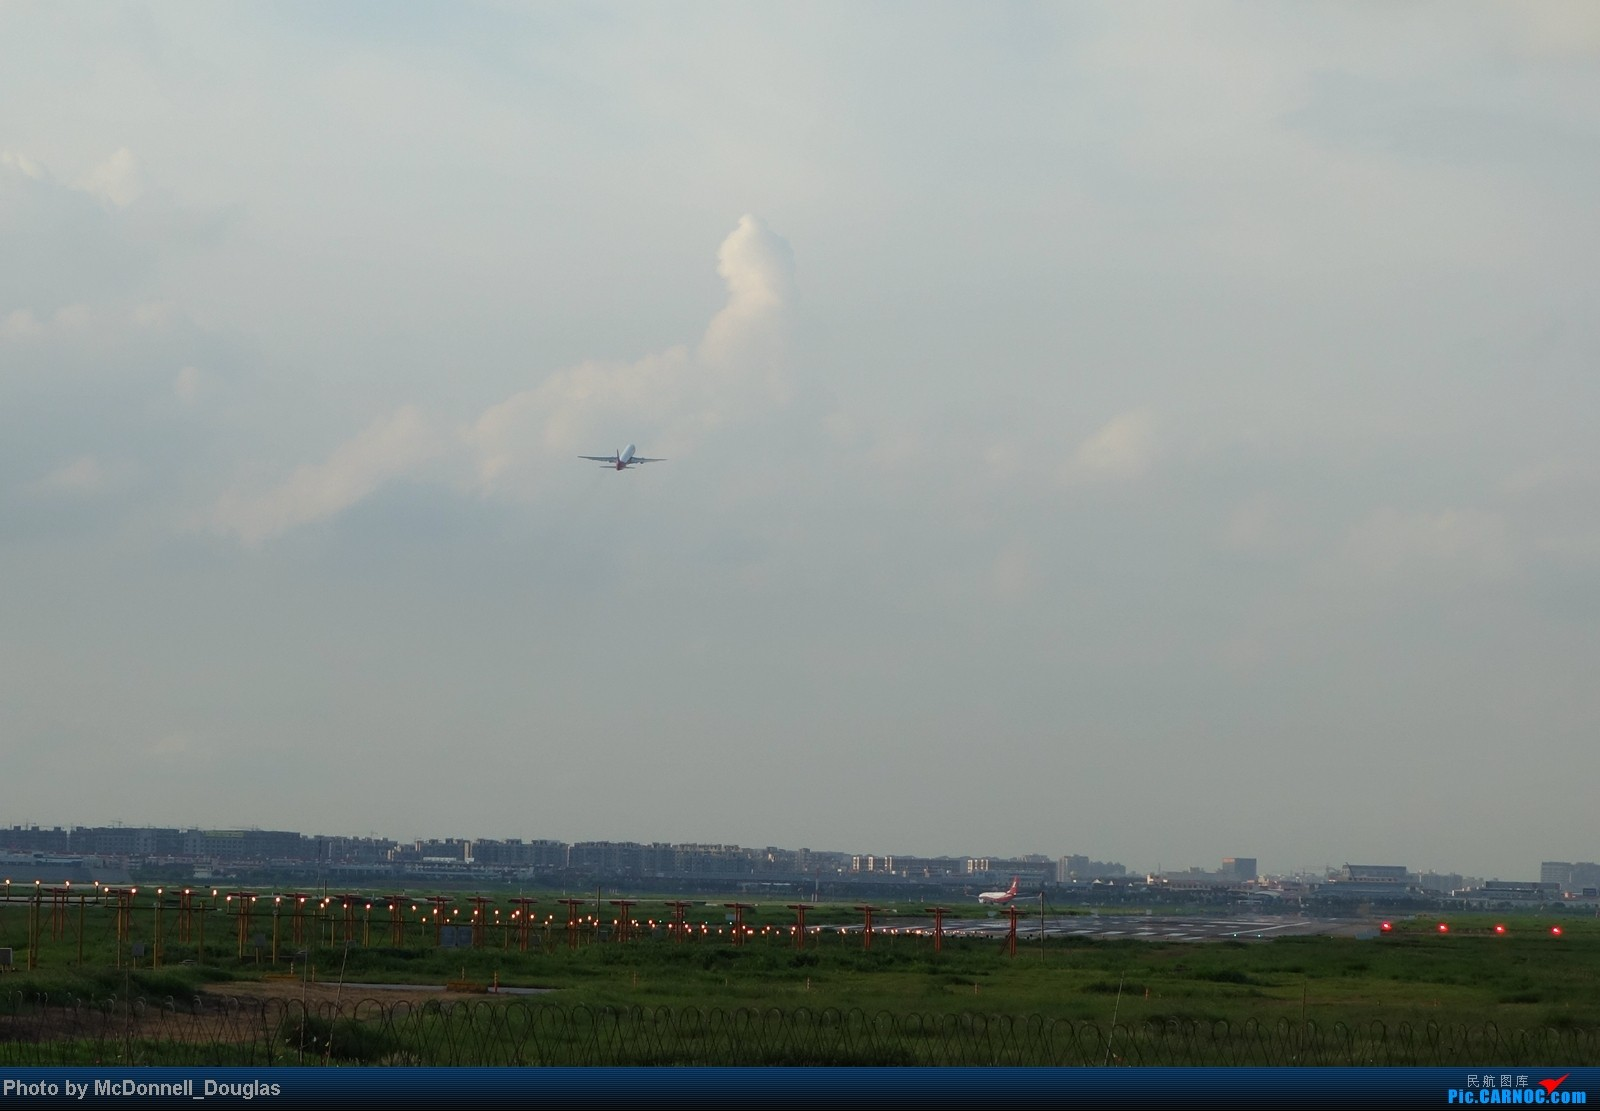 Re:[原创]【上海飞友会】ZSSS杂图一组 BOEING 737-800 B-5549 中国上海虹桥机场 中国上海虹桥机场